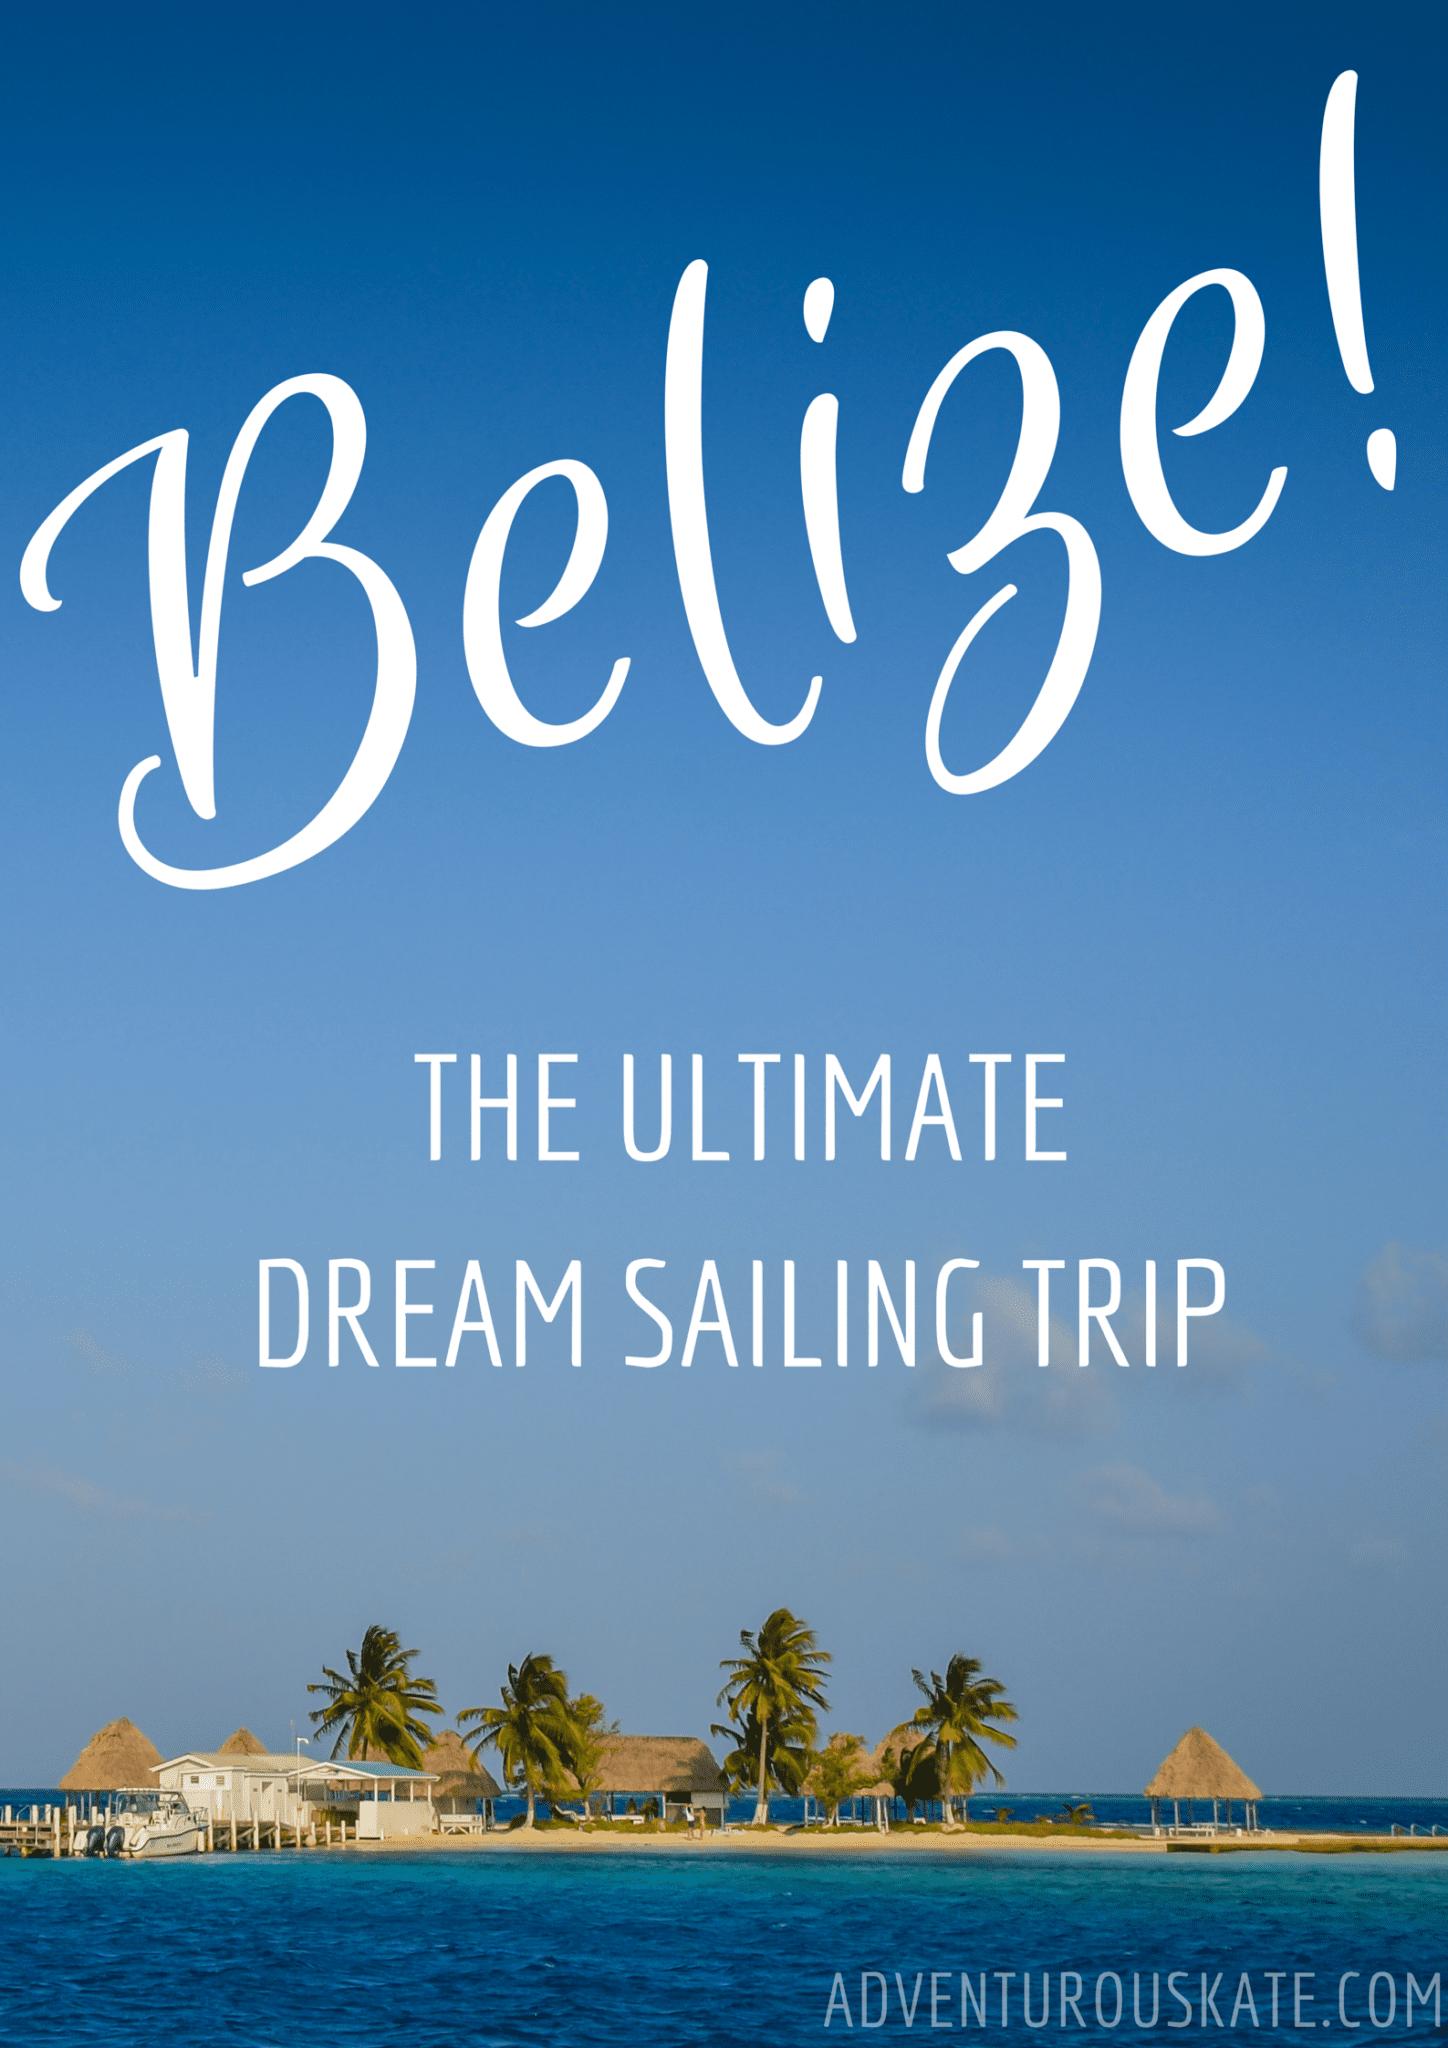 Belize! The Ultimate Dream Sailing Trip. Via Adventurous Kate